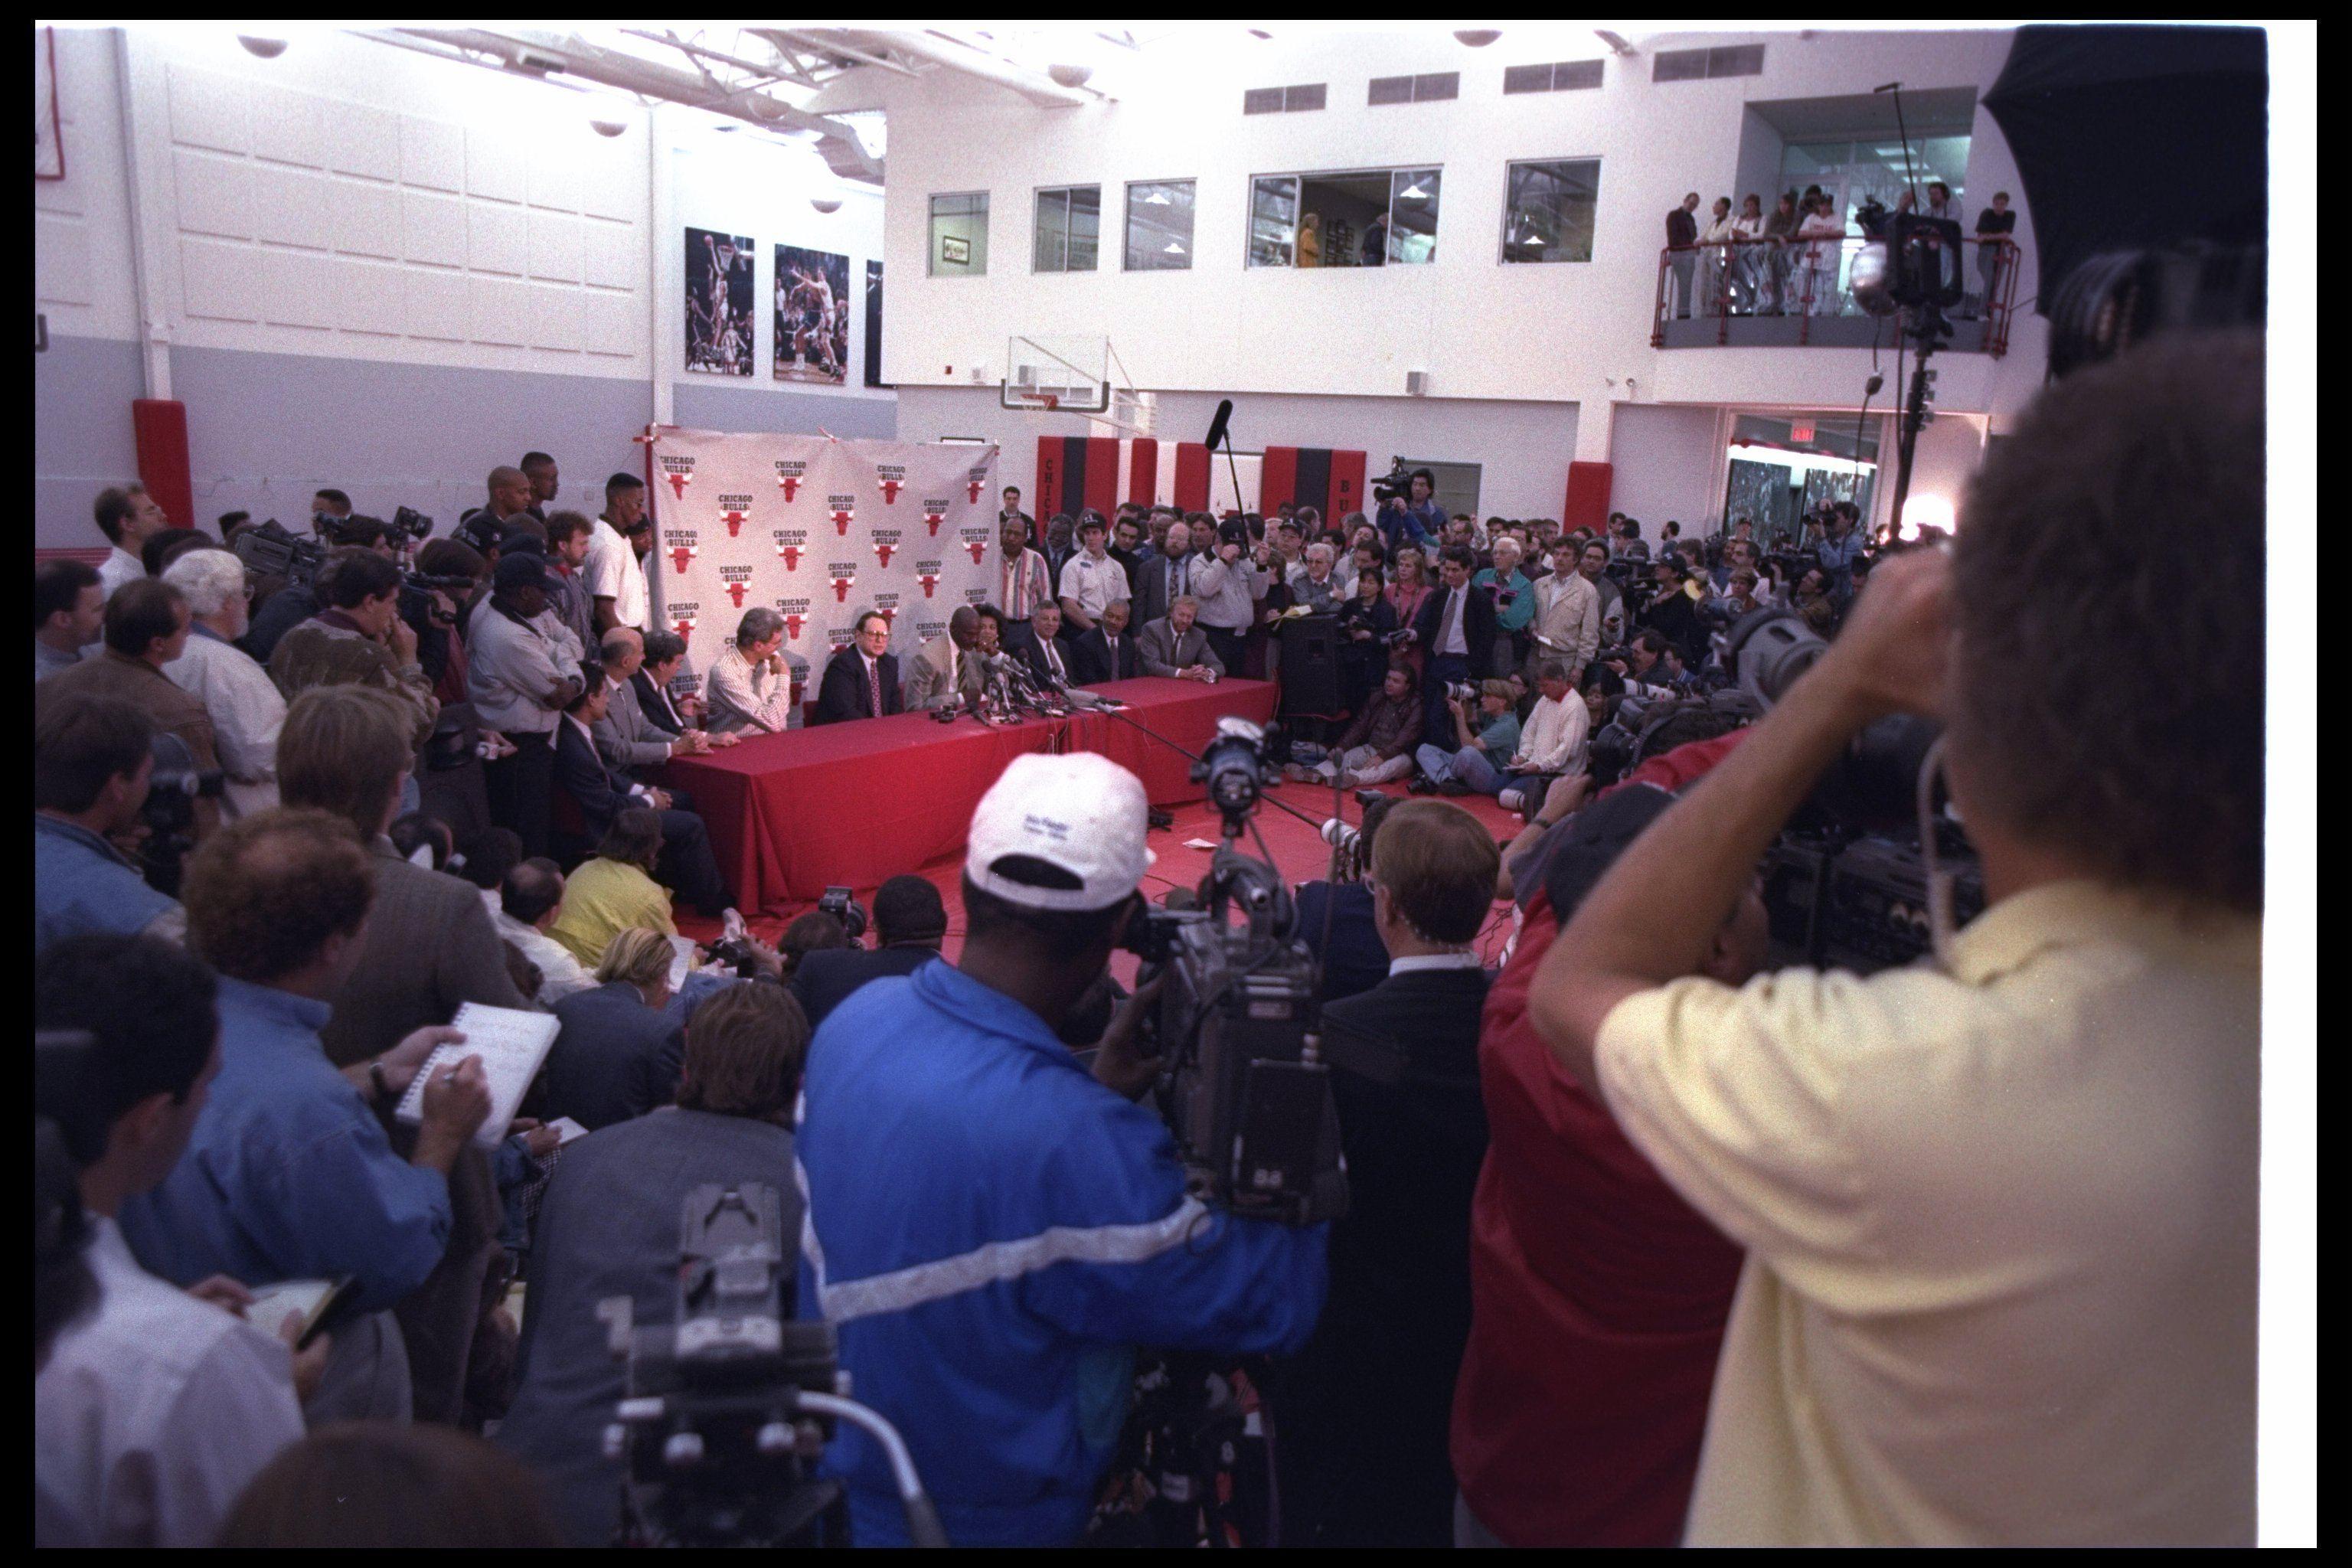 Michael Jordan Oct. 6, 1993 retirement